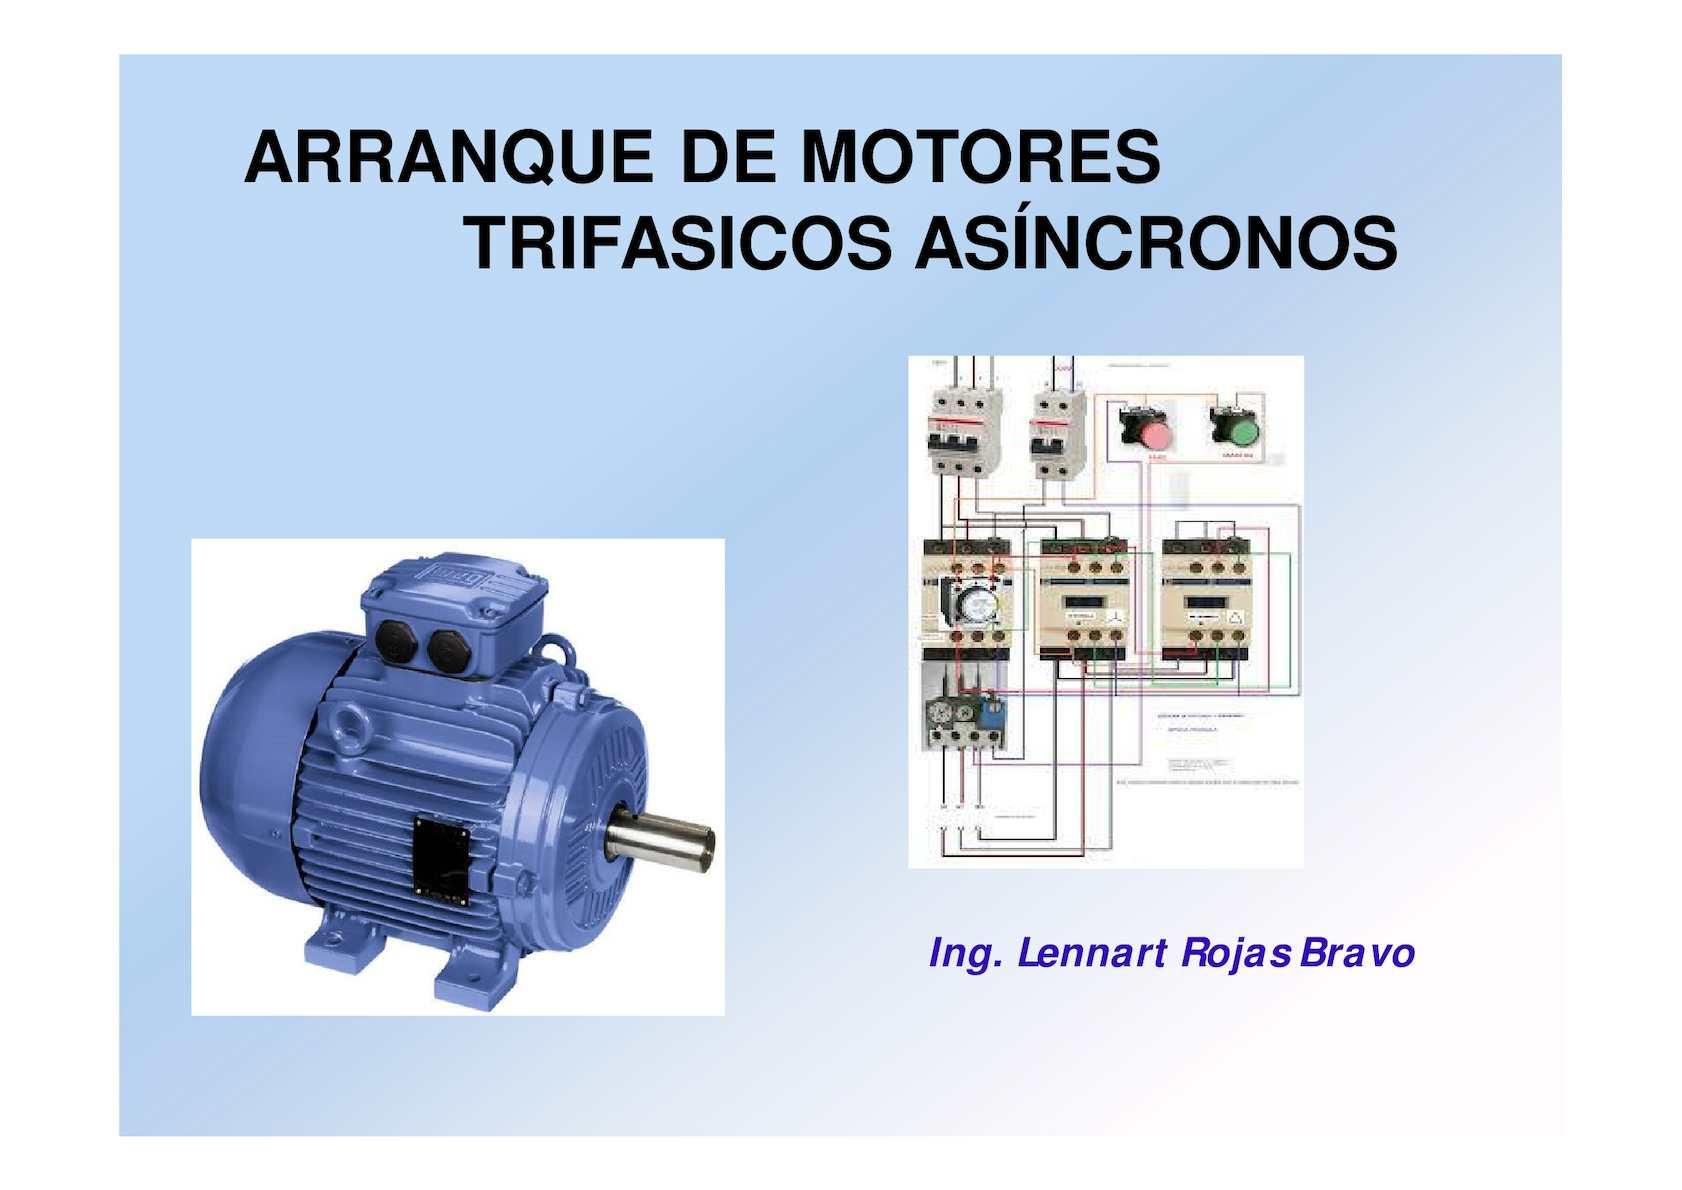 Calaméo - ARRANQUE DE MOTORES TRIFASICOS ASINCRONOS - VAF